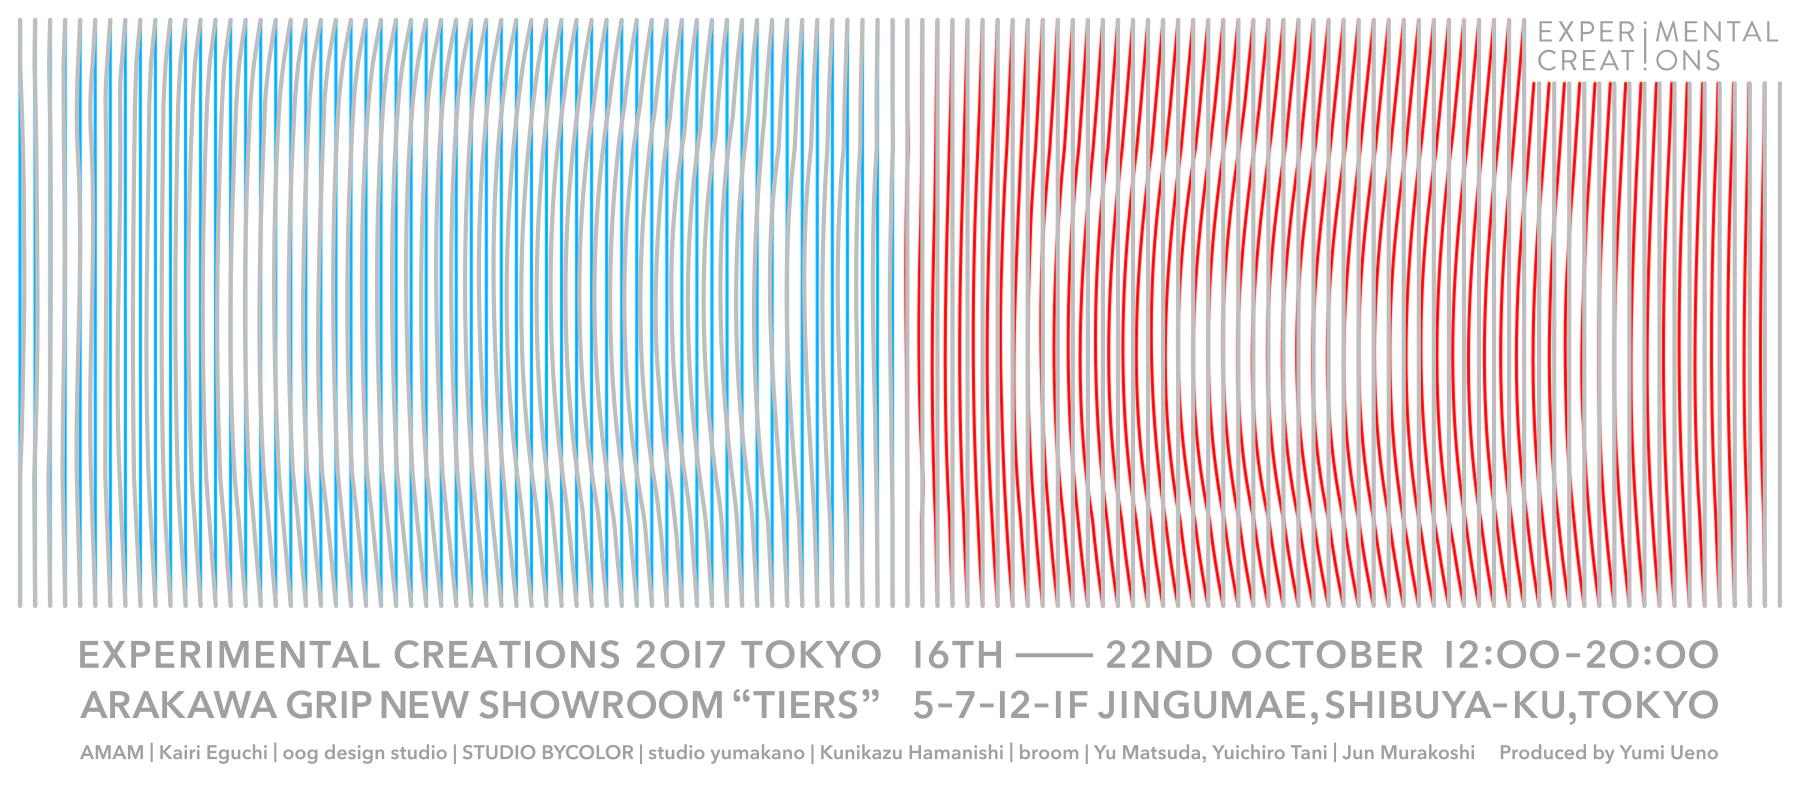 <a href='http://experimental-creations.com/ja/experimental-creations-2017-tokyo/'></a>